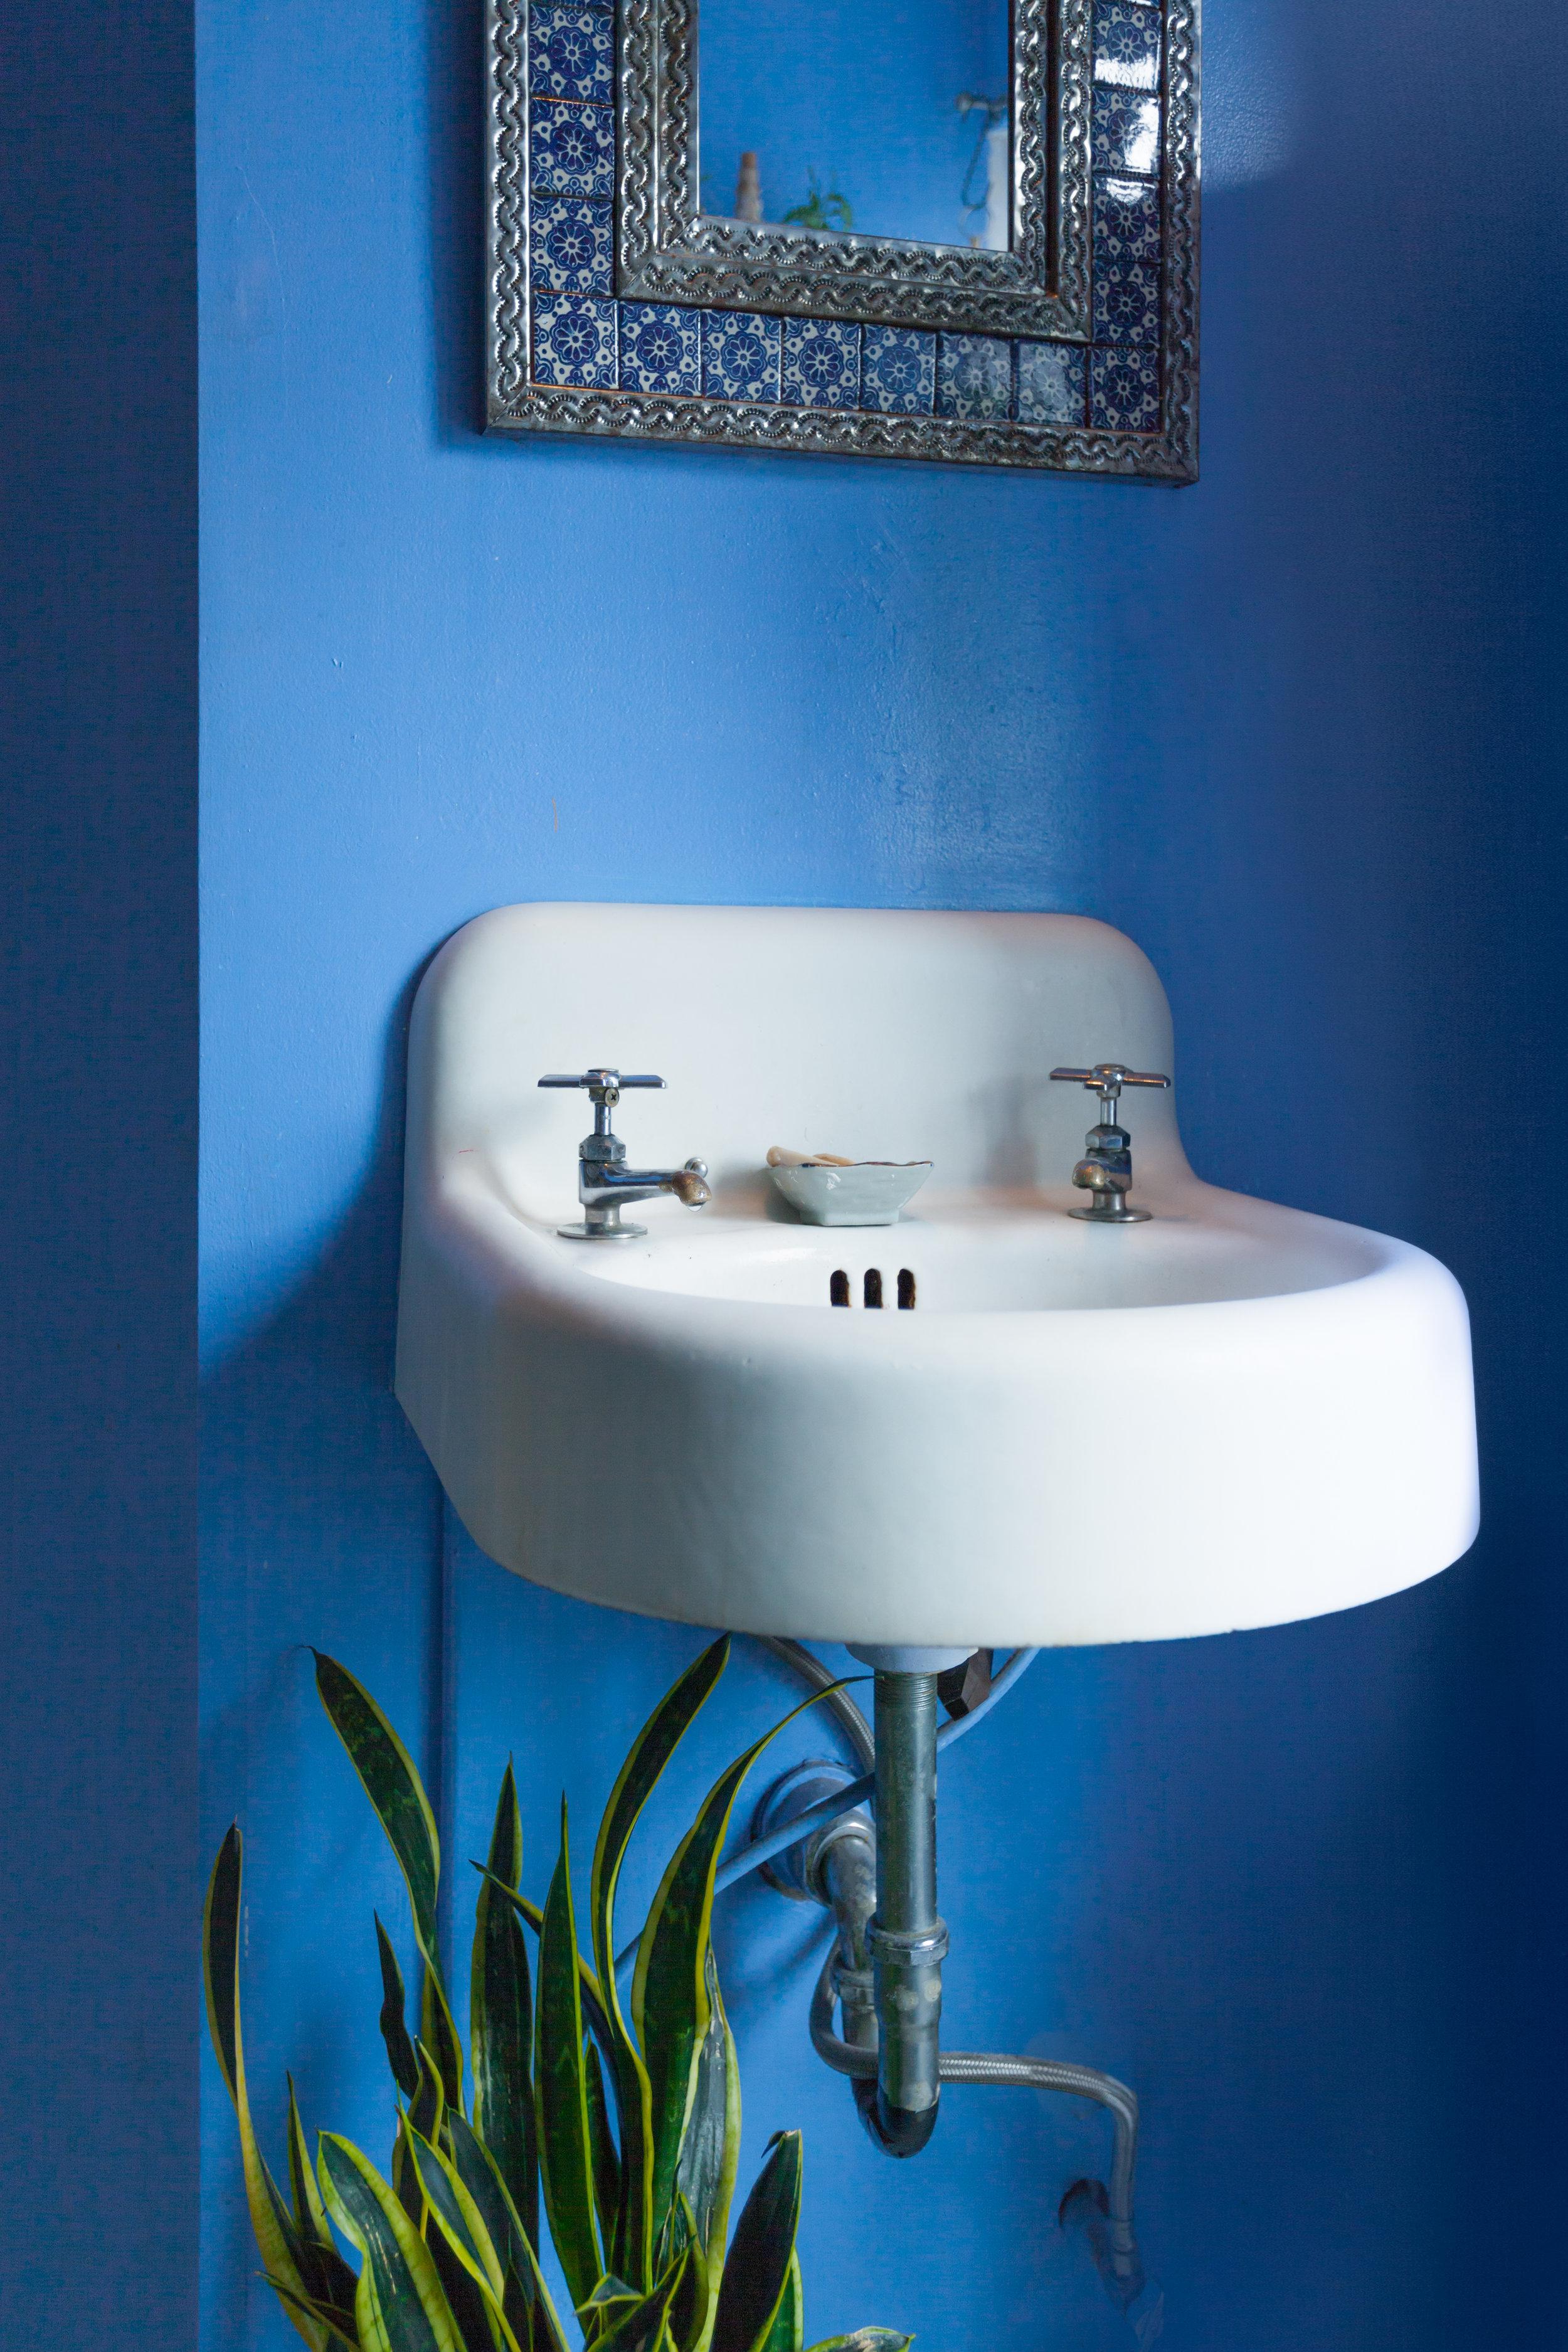 01_Bathroom_8104-Summer-Rayne-Oakes_Sink.jpg